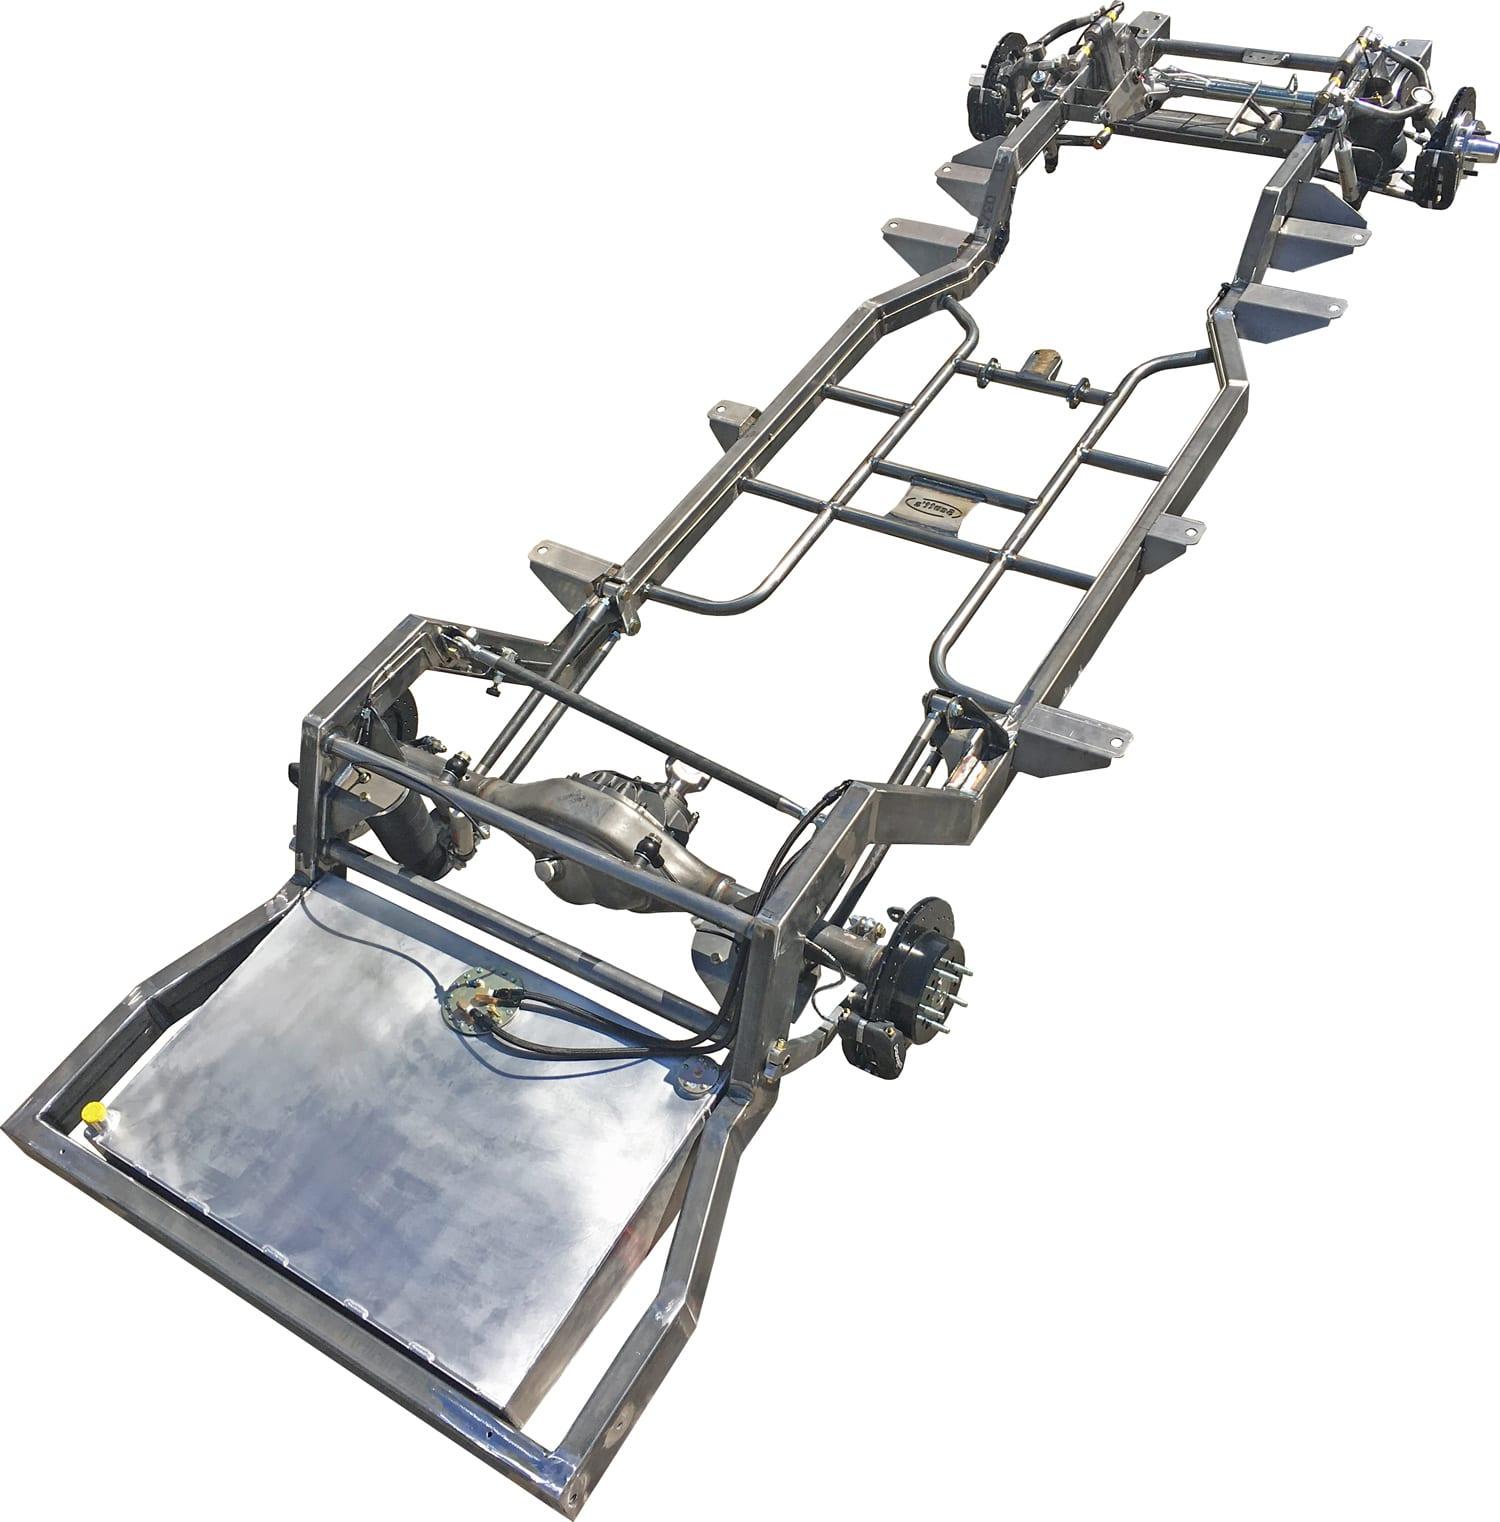 scotts-hotrods-1949-1951-mercury-chassis-1